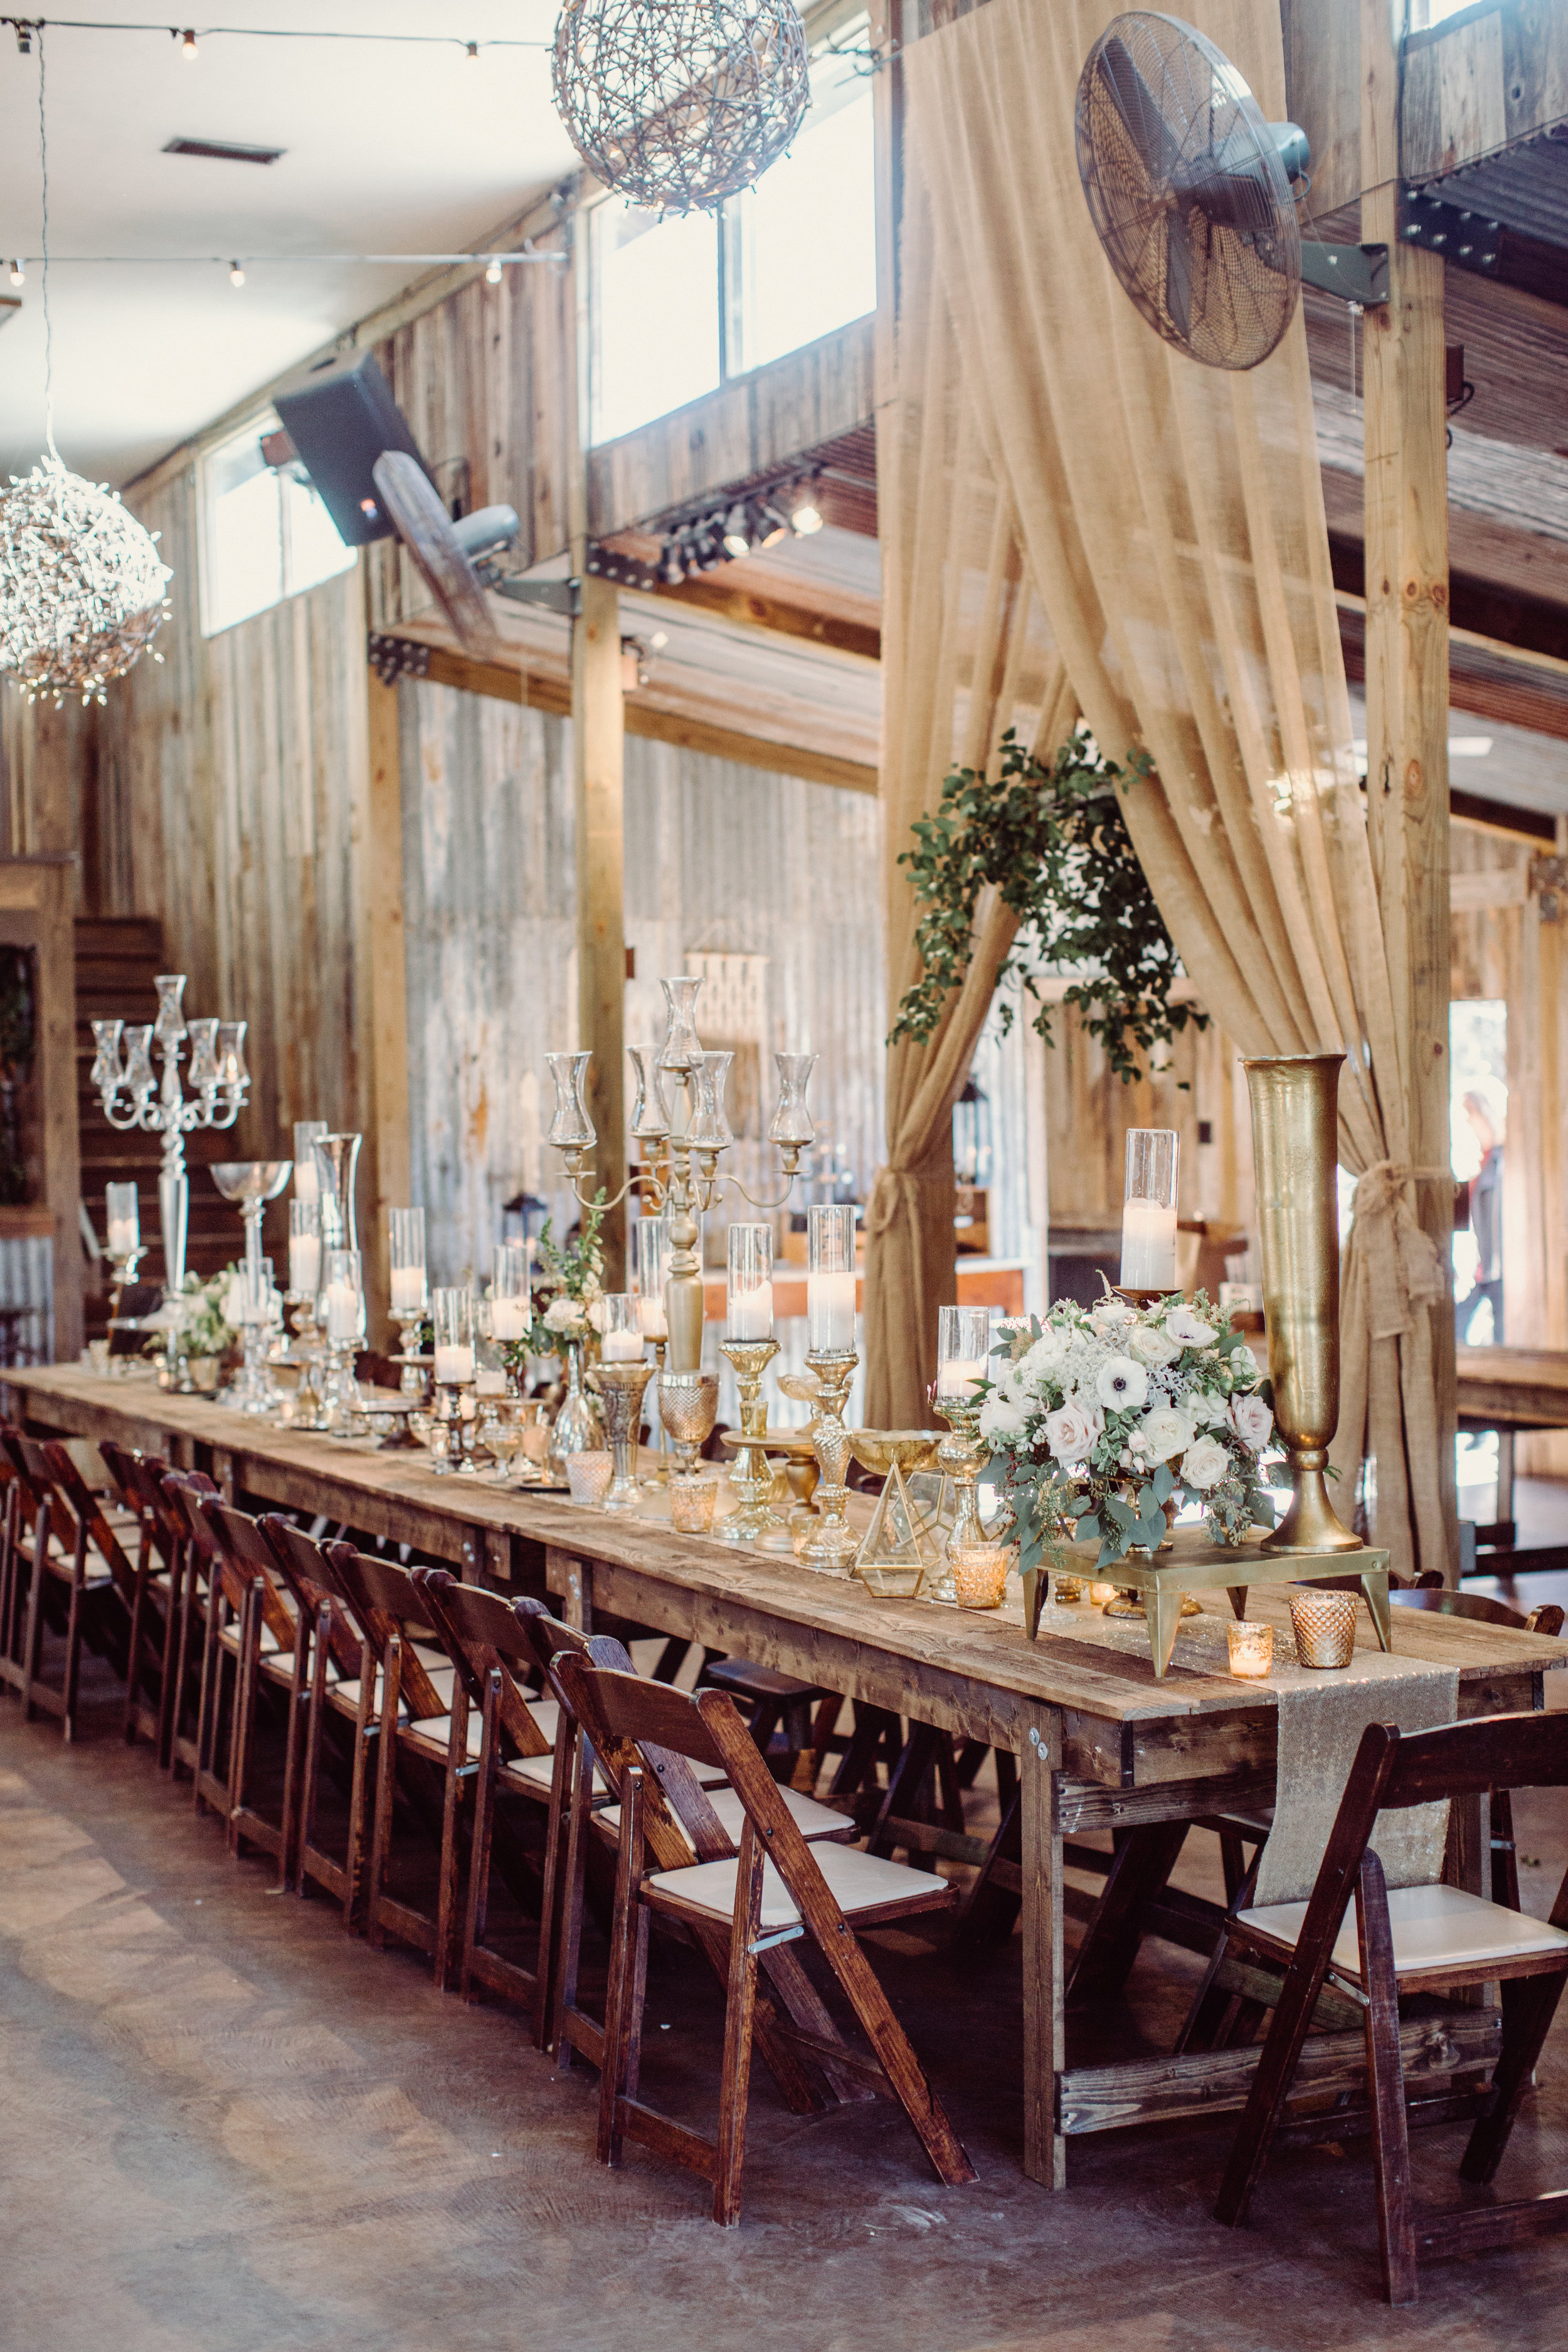 vista-west-ranch-barn-reception-venue-ceremony-texas-hill-country-wedding-venue-with-lodging